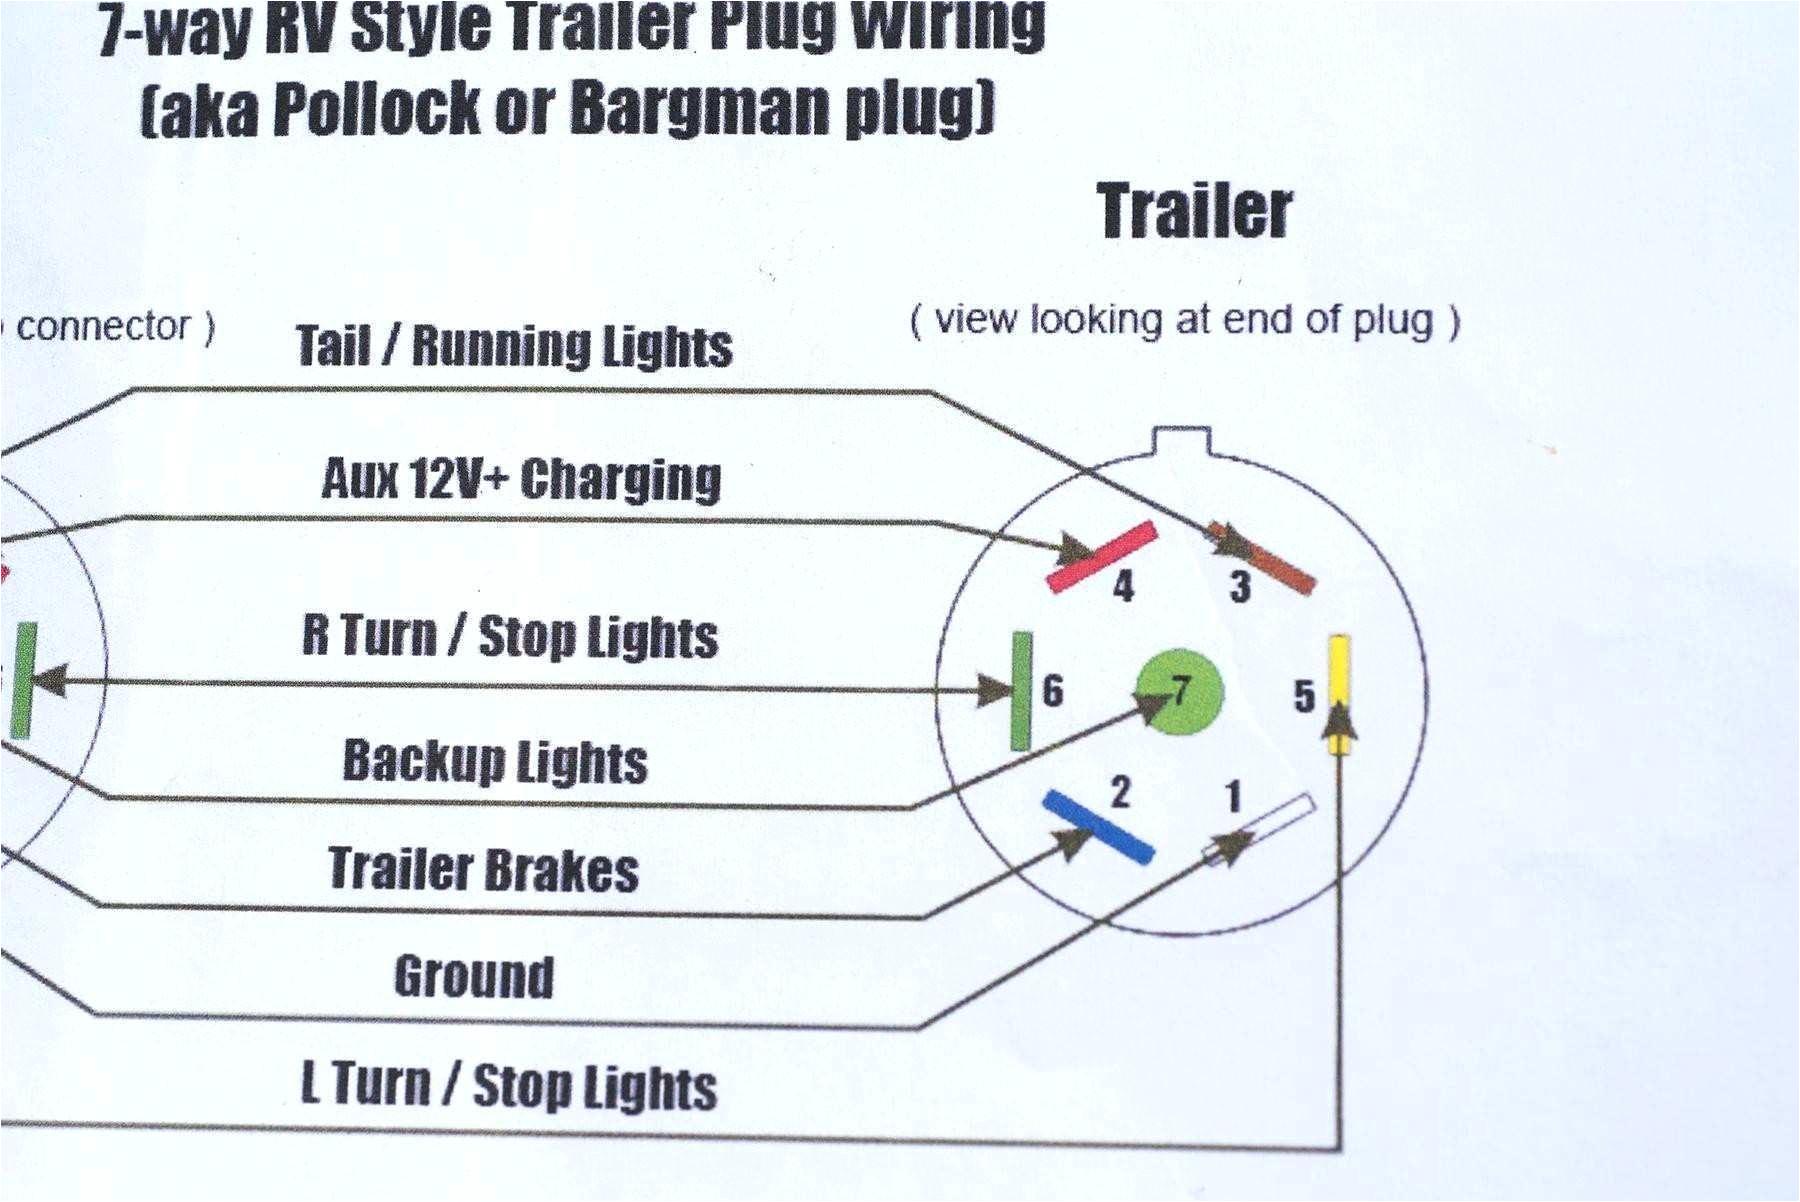 reese trailer wiring diagram wiring diagrams reese trailer wiring diagram reese 7 pin trailer wiring diagram